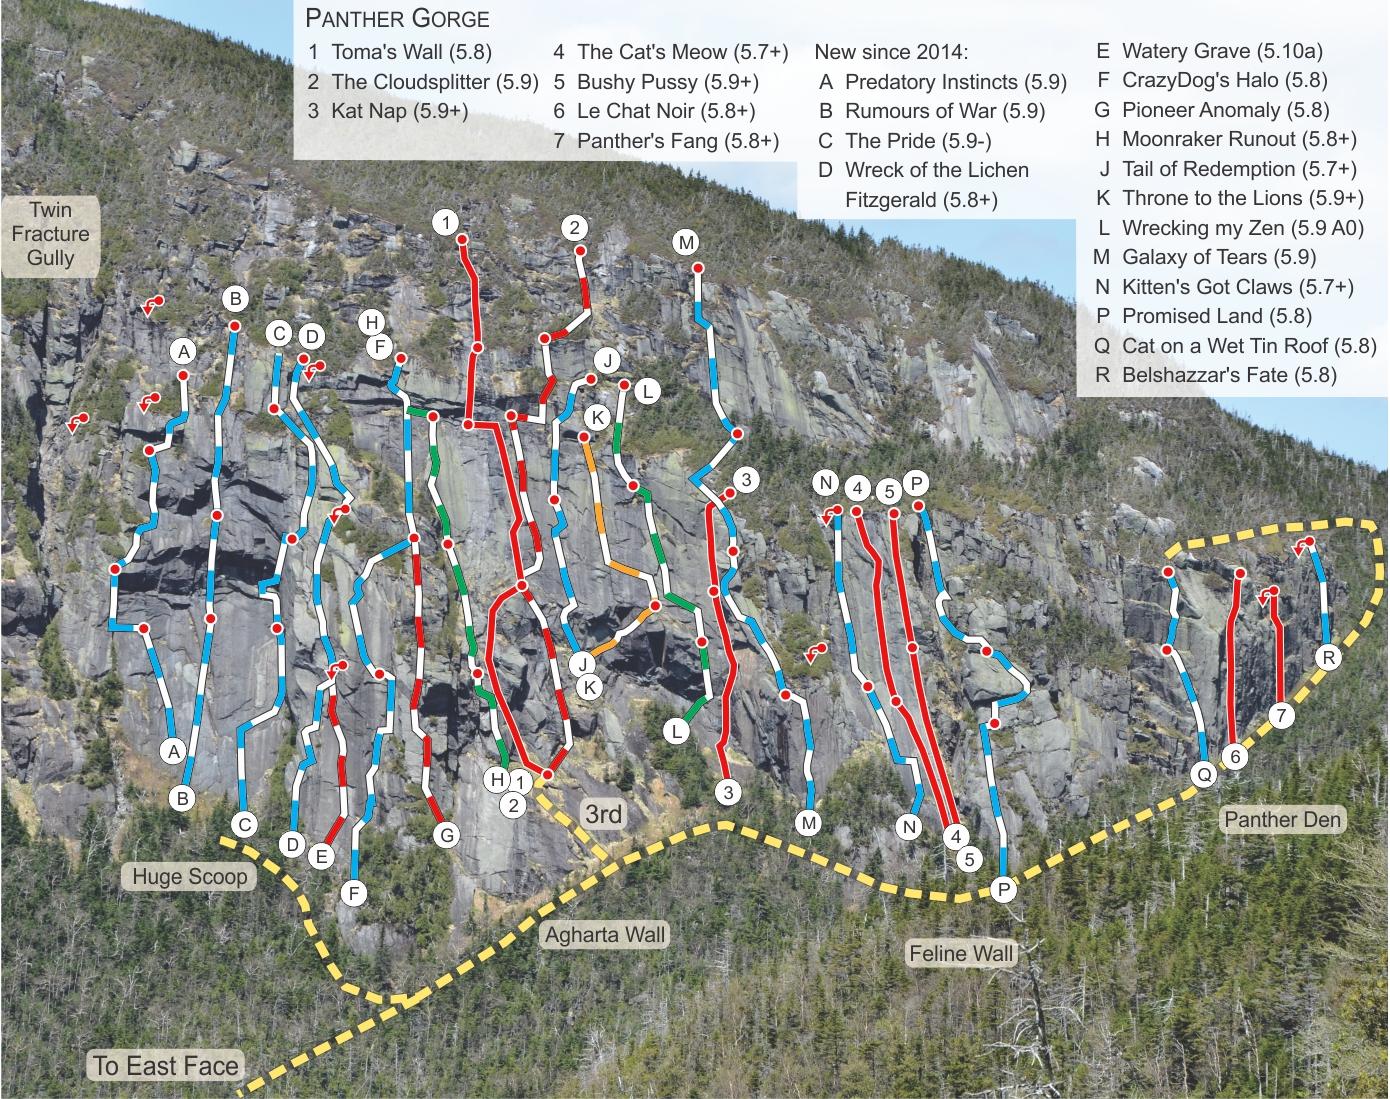 Adirondack Rock - New Routes